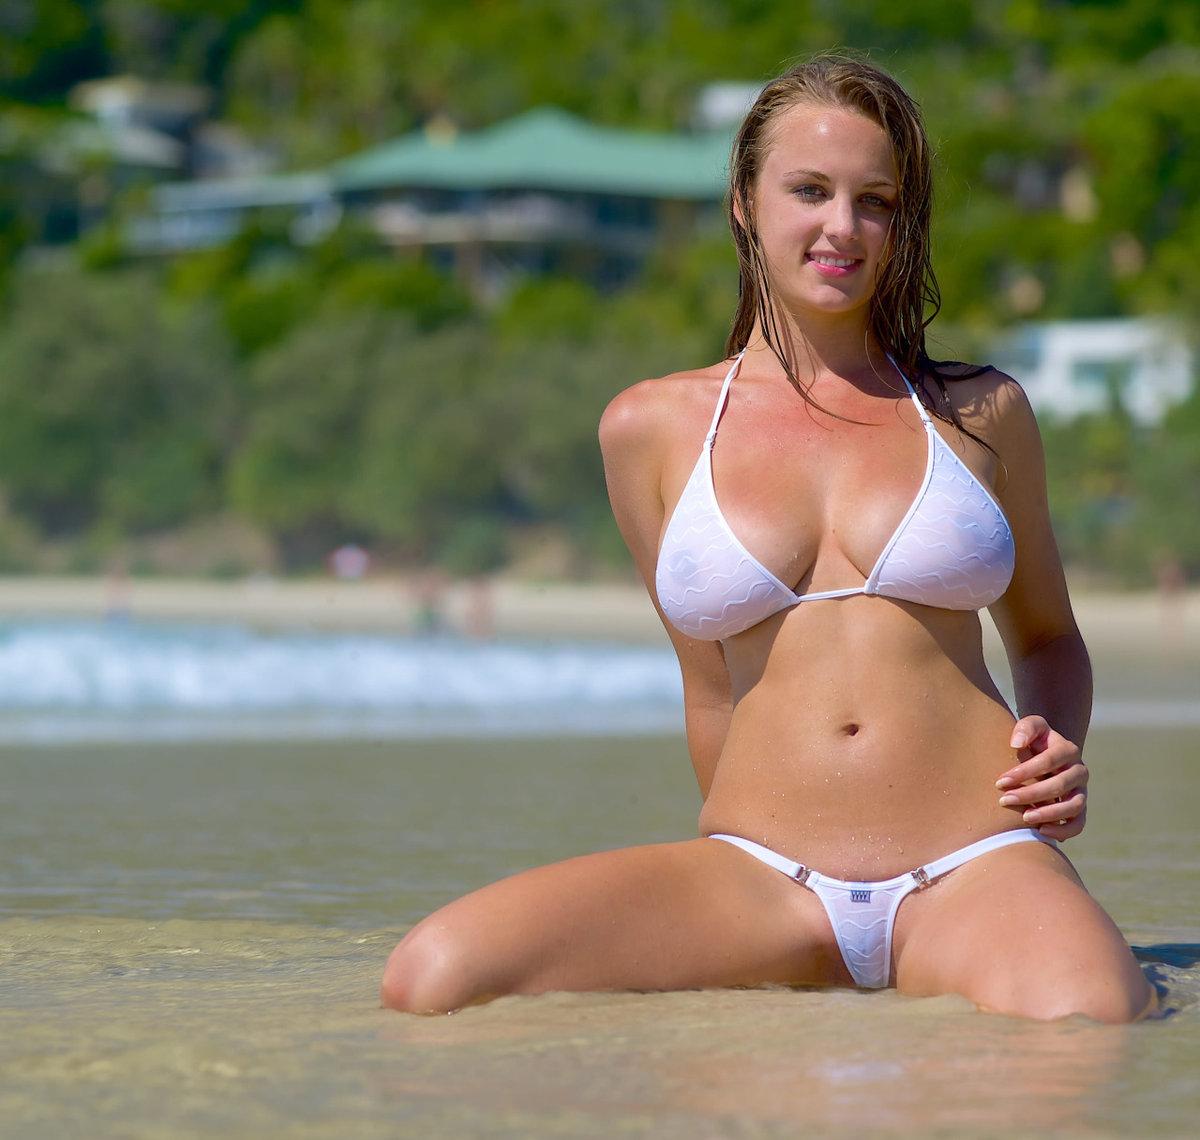 chastnoe-foto-v-bikini-video-anal-mah-hardkor